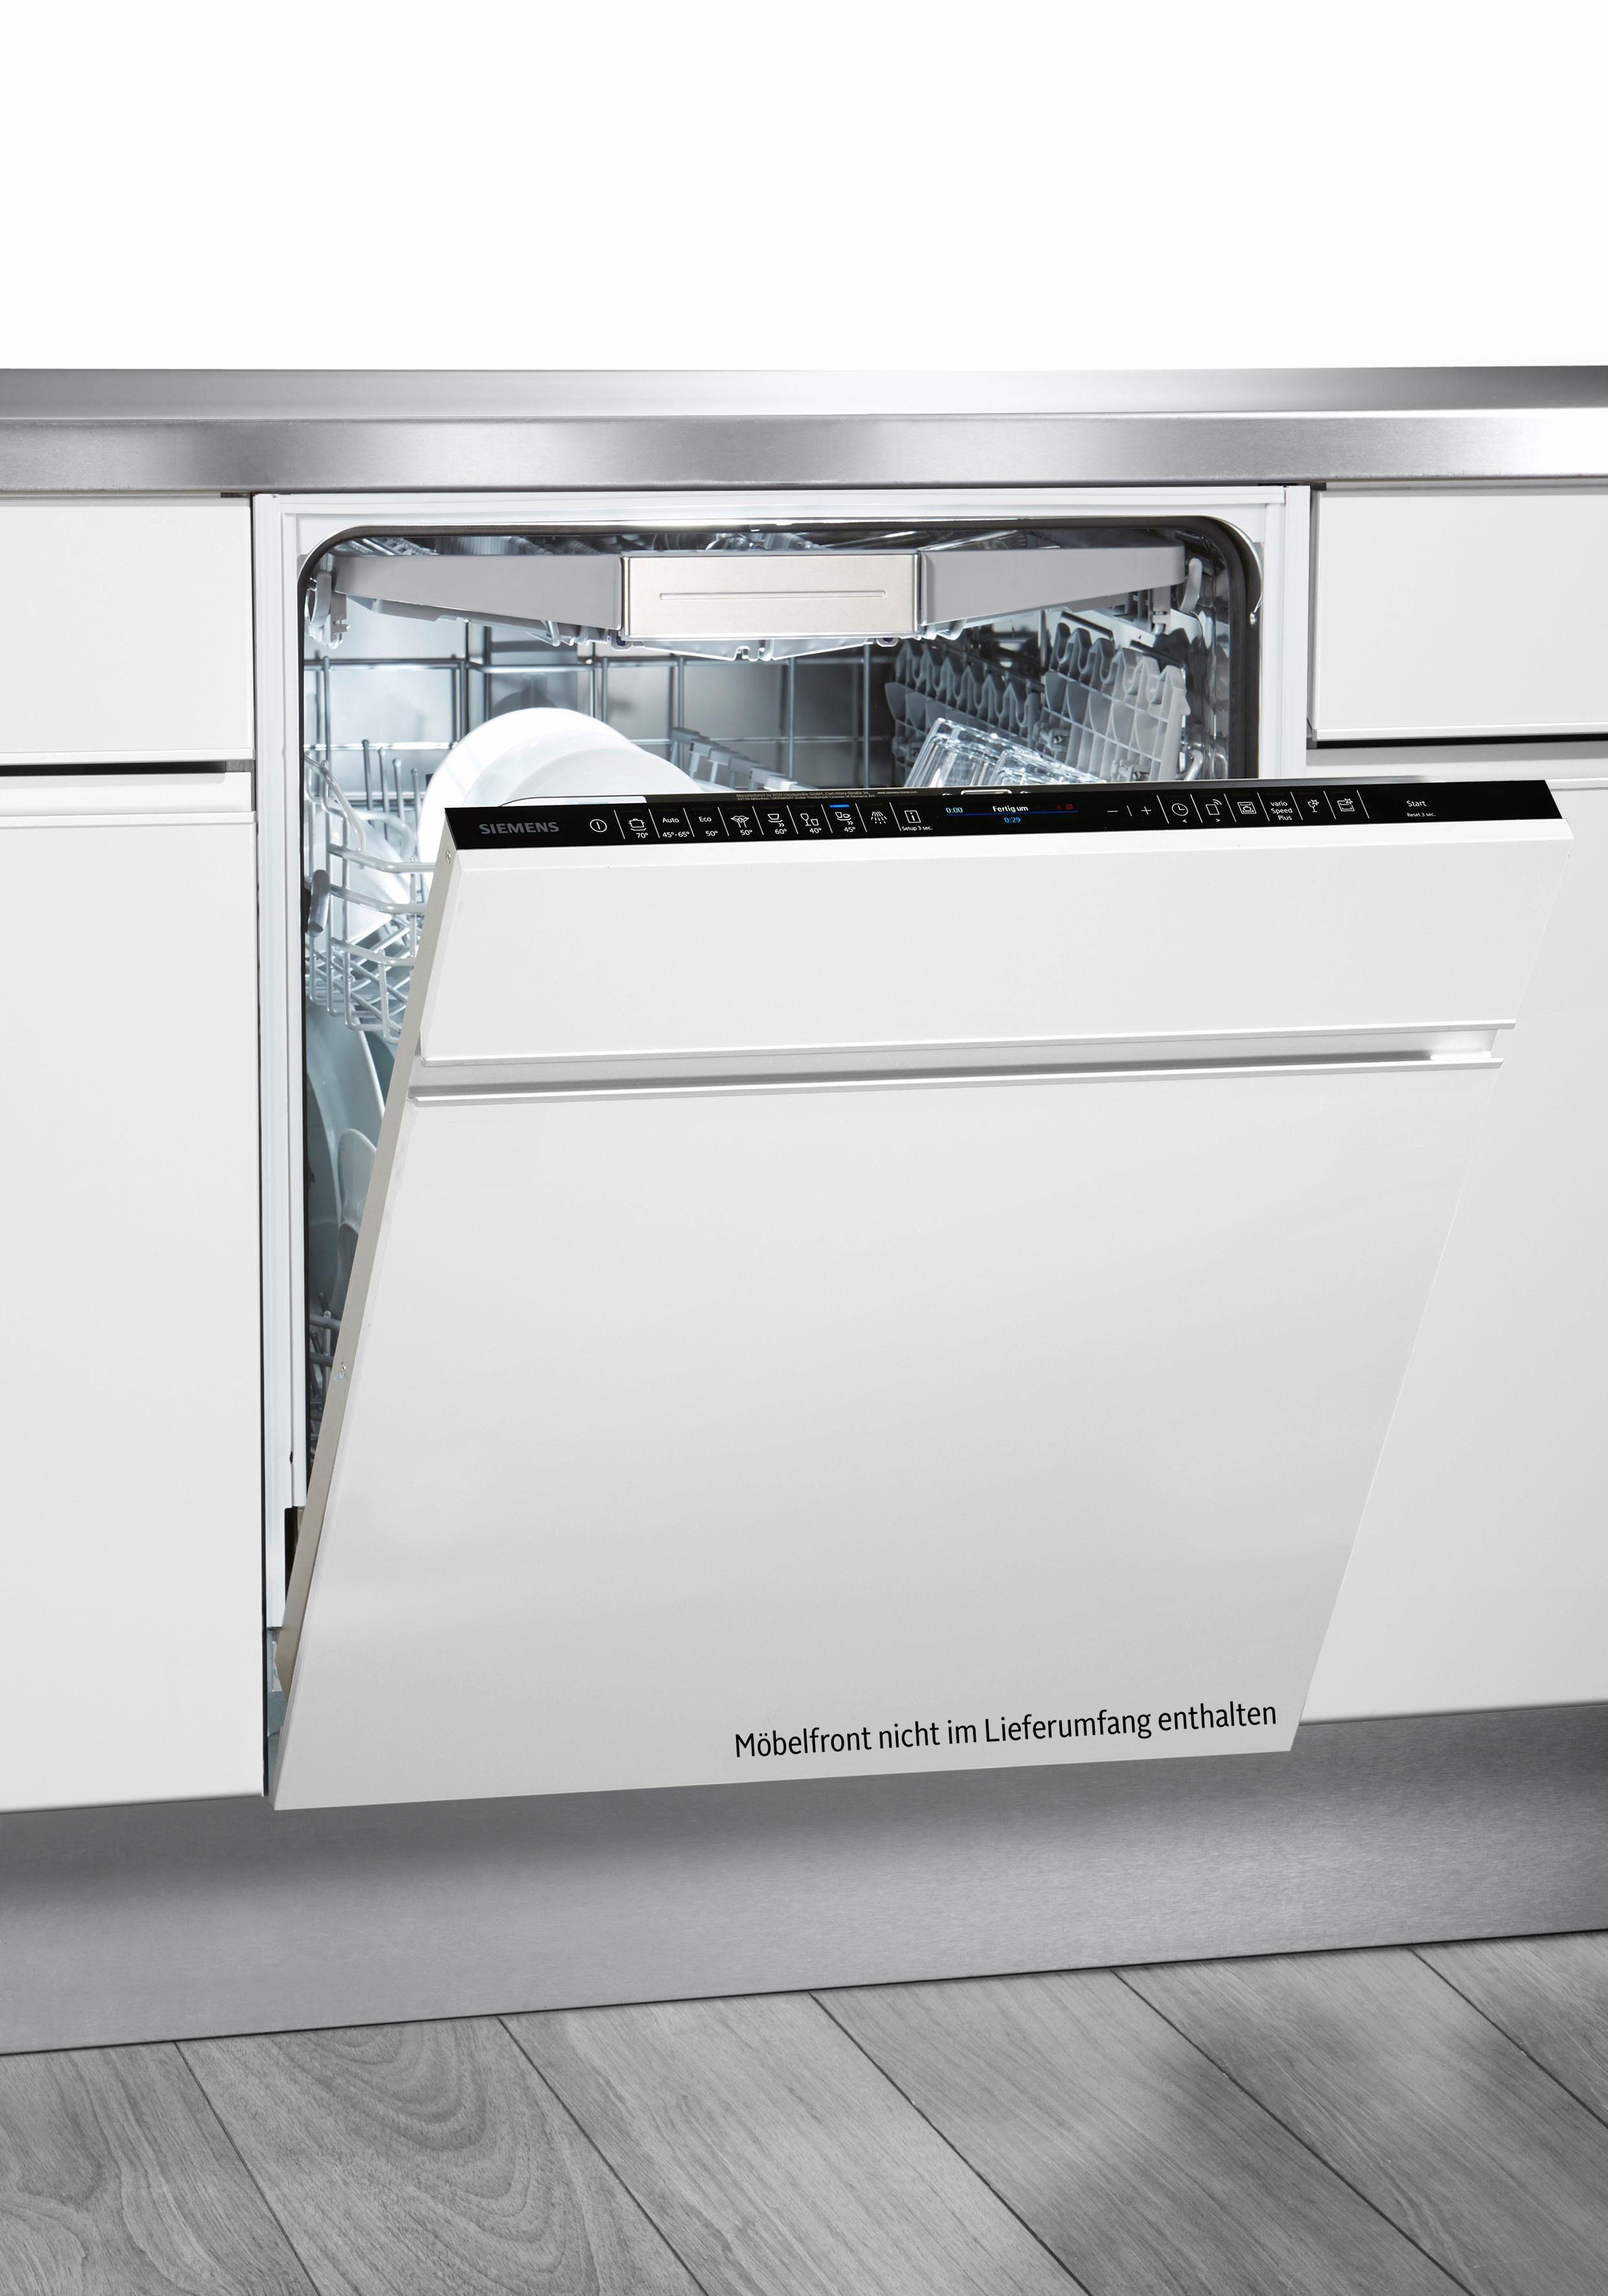 SIEMENS Vollintegrierbarer Einbaugeschirrspüler iQ500 SX658X06TE, A+++, 9,5 Liter, 14 Maßgedecke